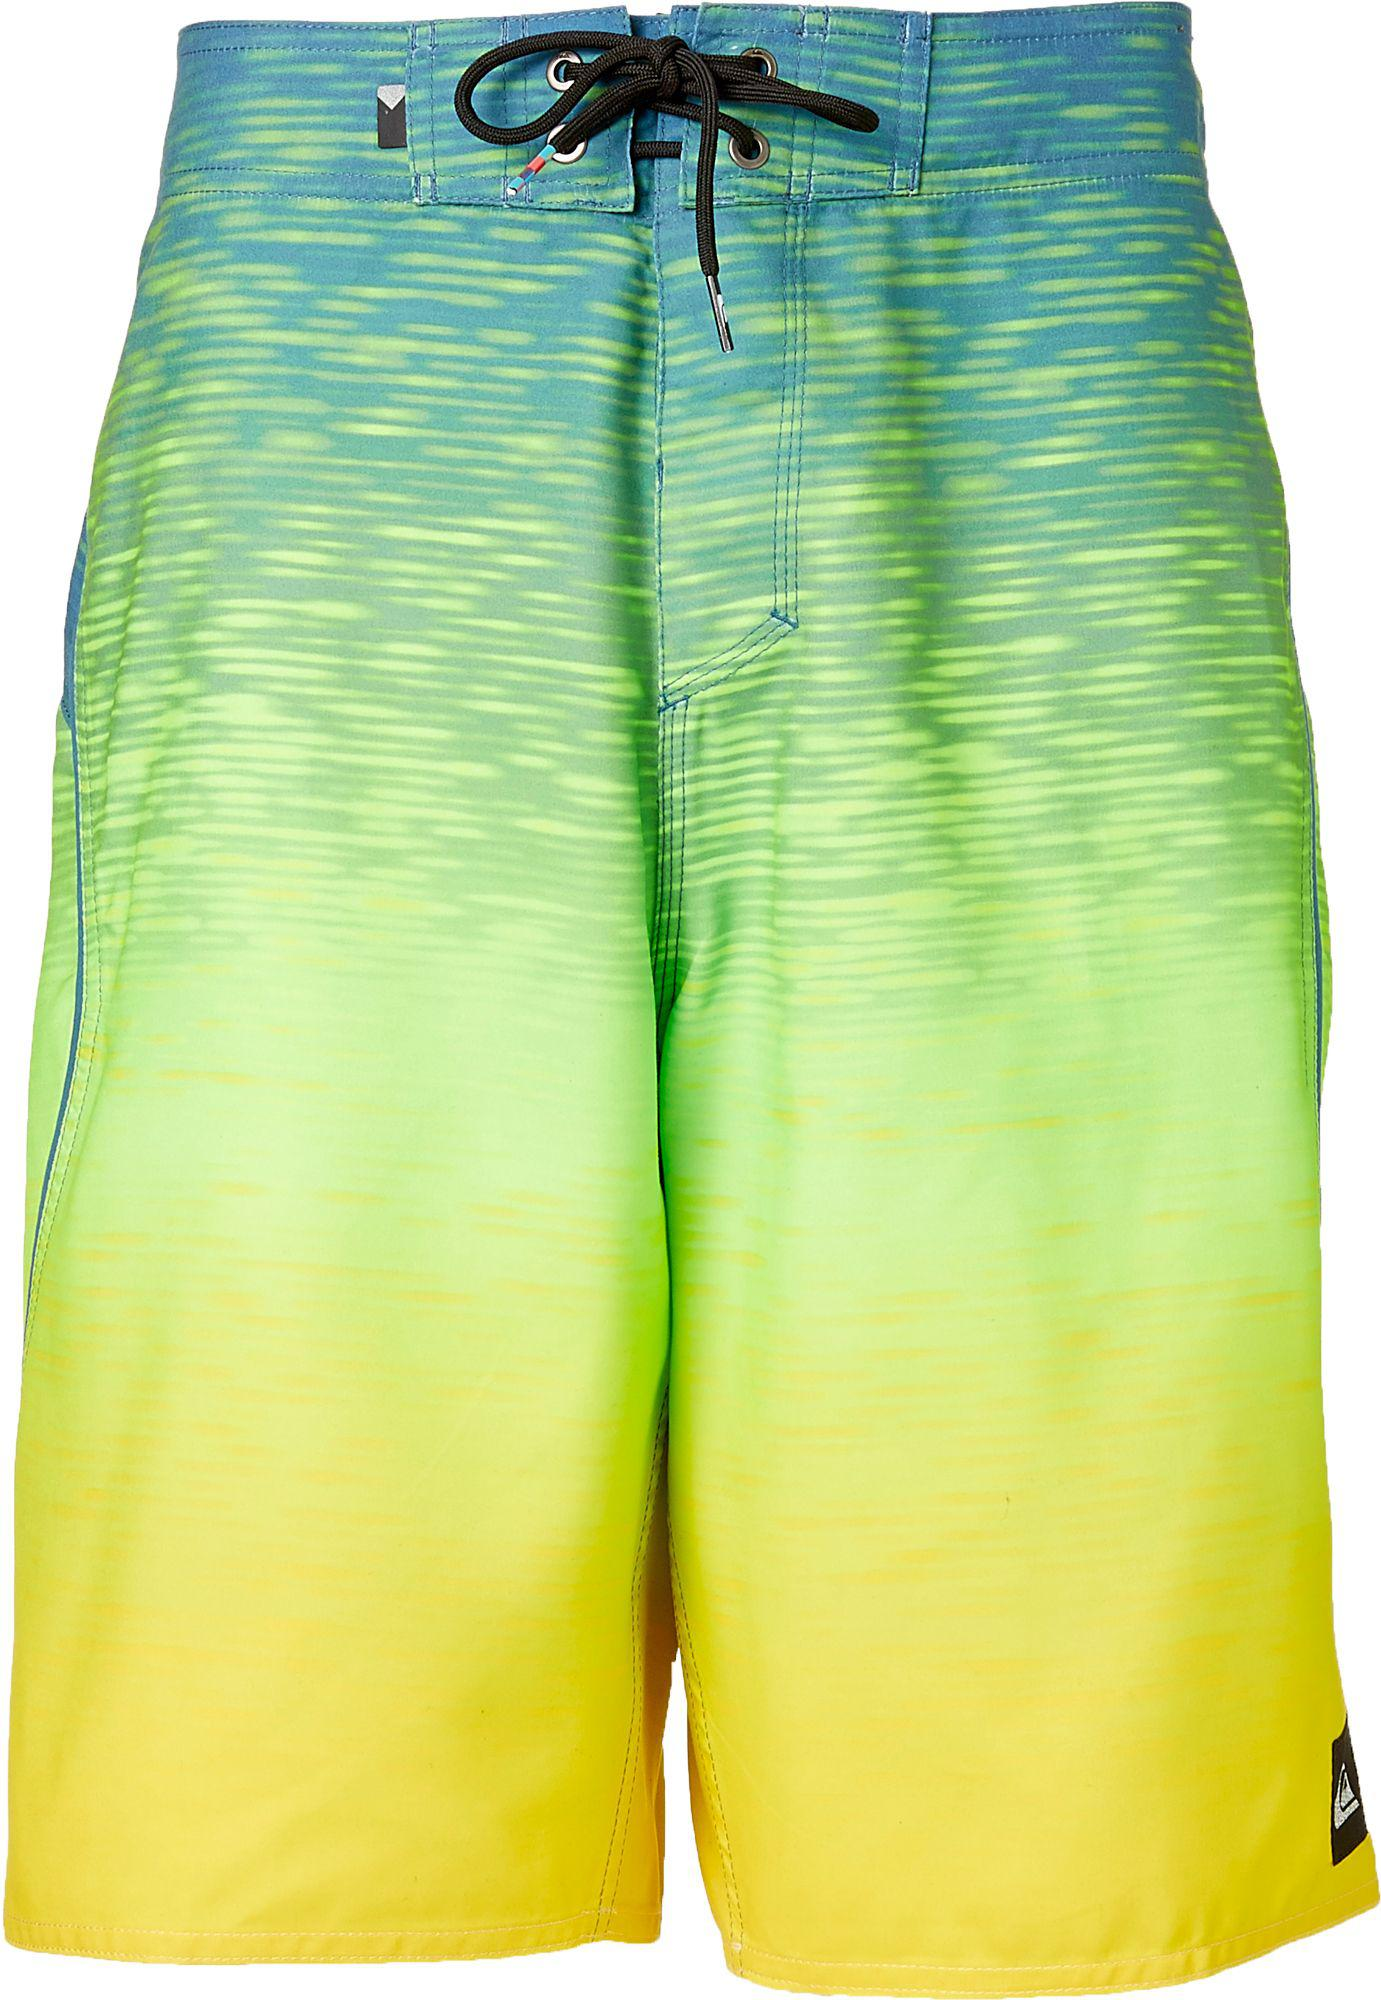 6783f9467f Quiksilver Quicksilver Boy's Momentum Fader Board Shorts in Green ...